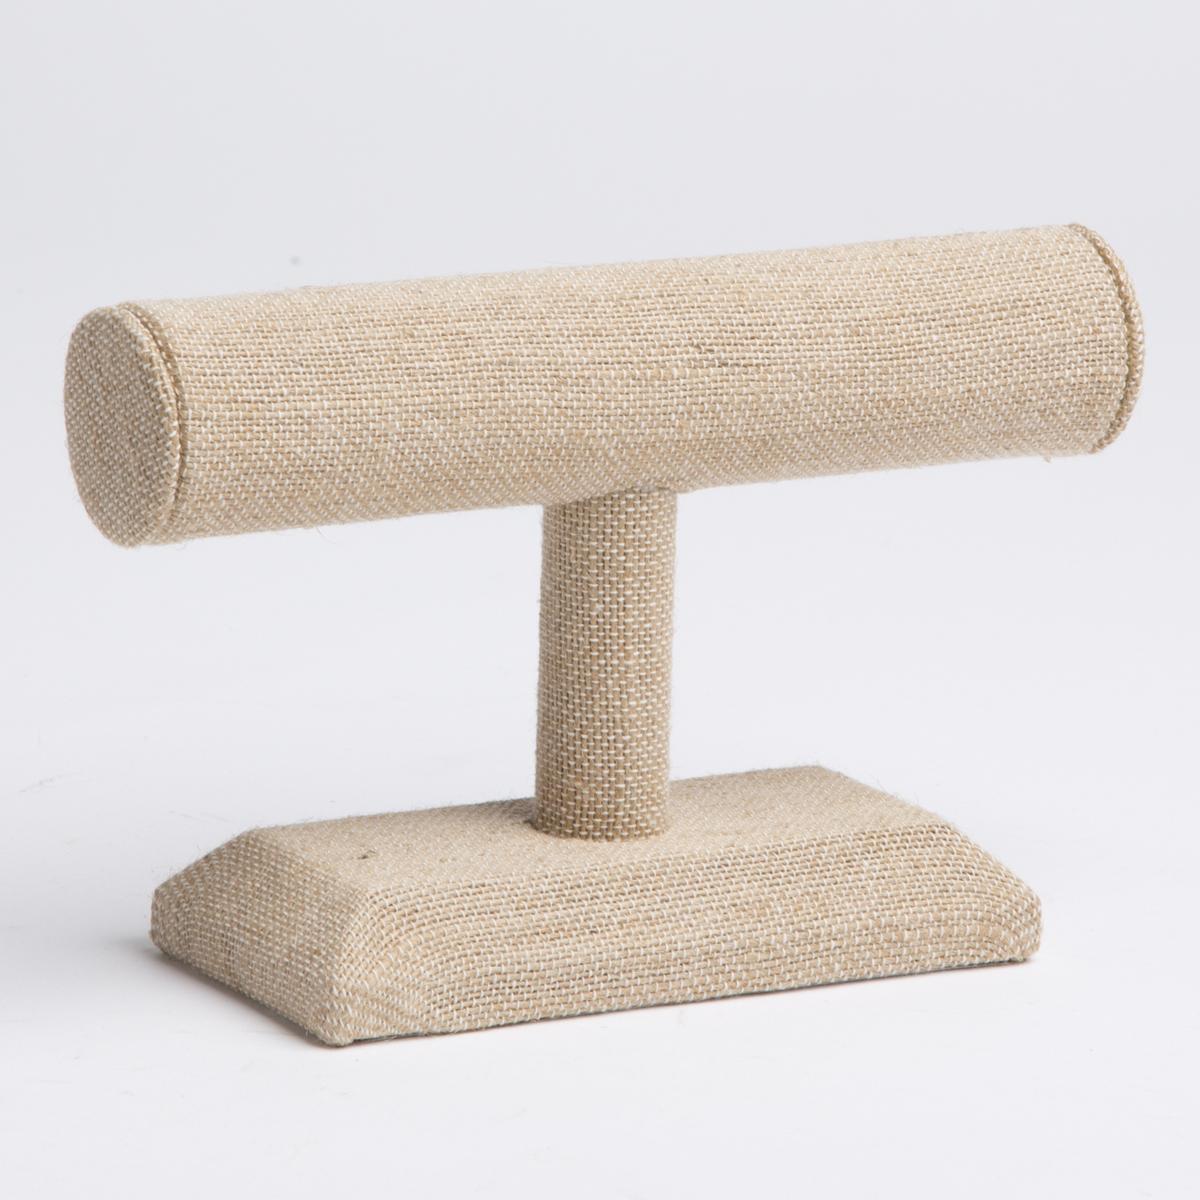 BRACELET SINGLE T-BAR-SMALL